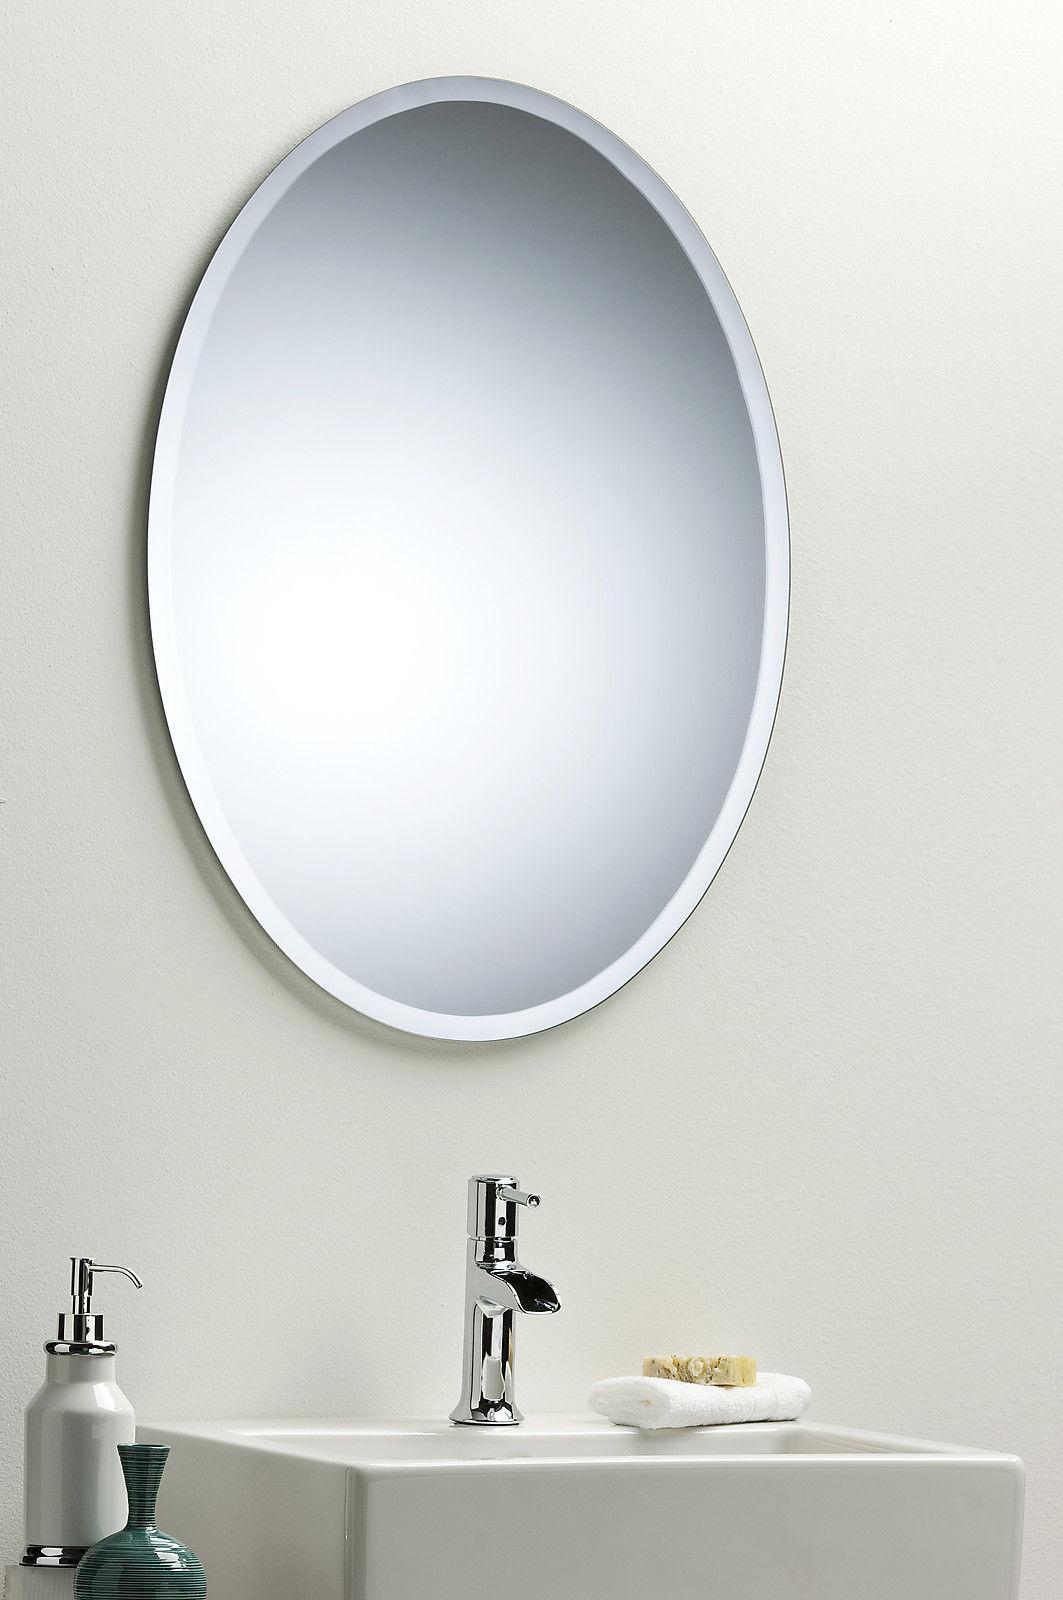 Bathroom Wall Mirror Modern Stylish Oval With Bevel Frameless Plain Ebay